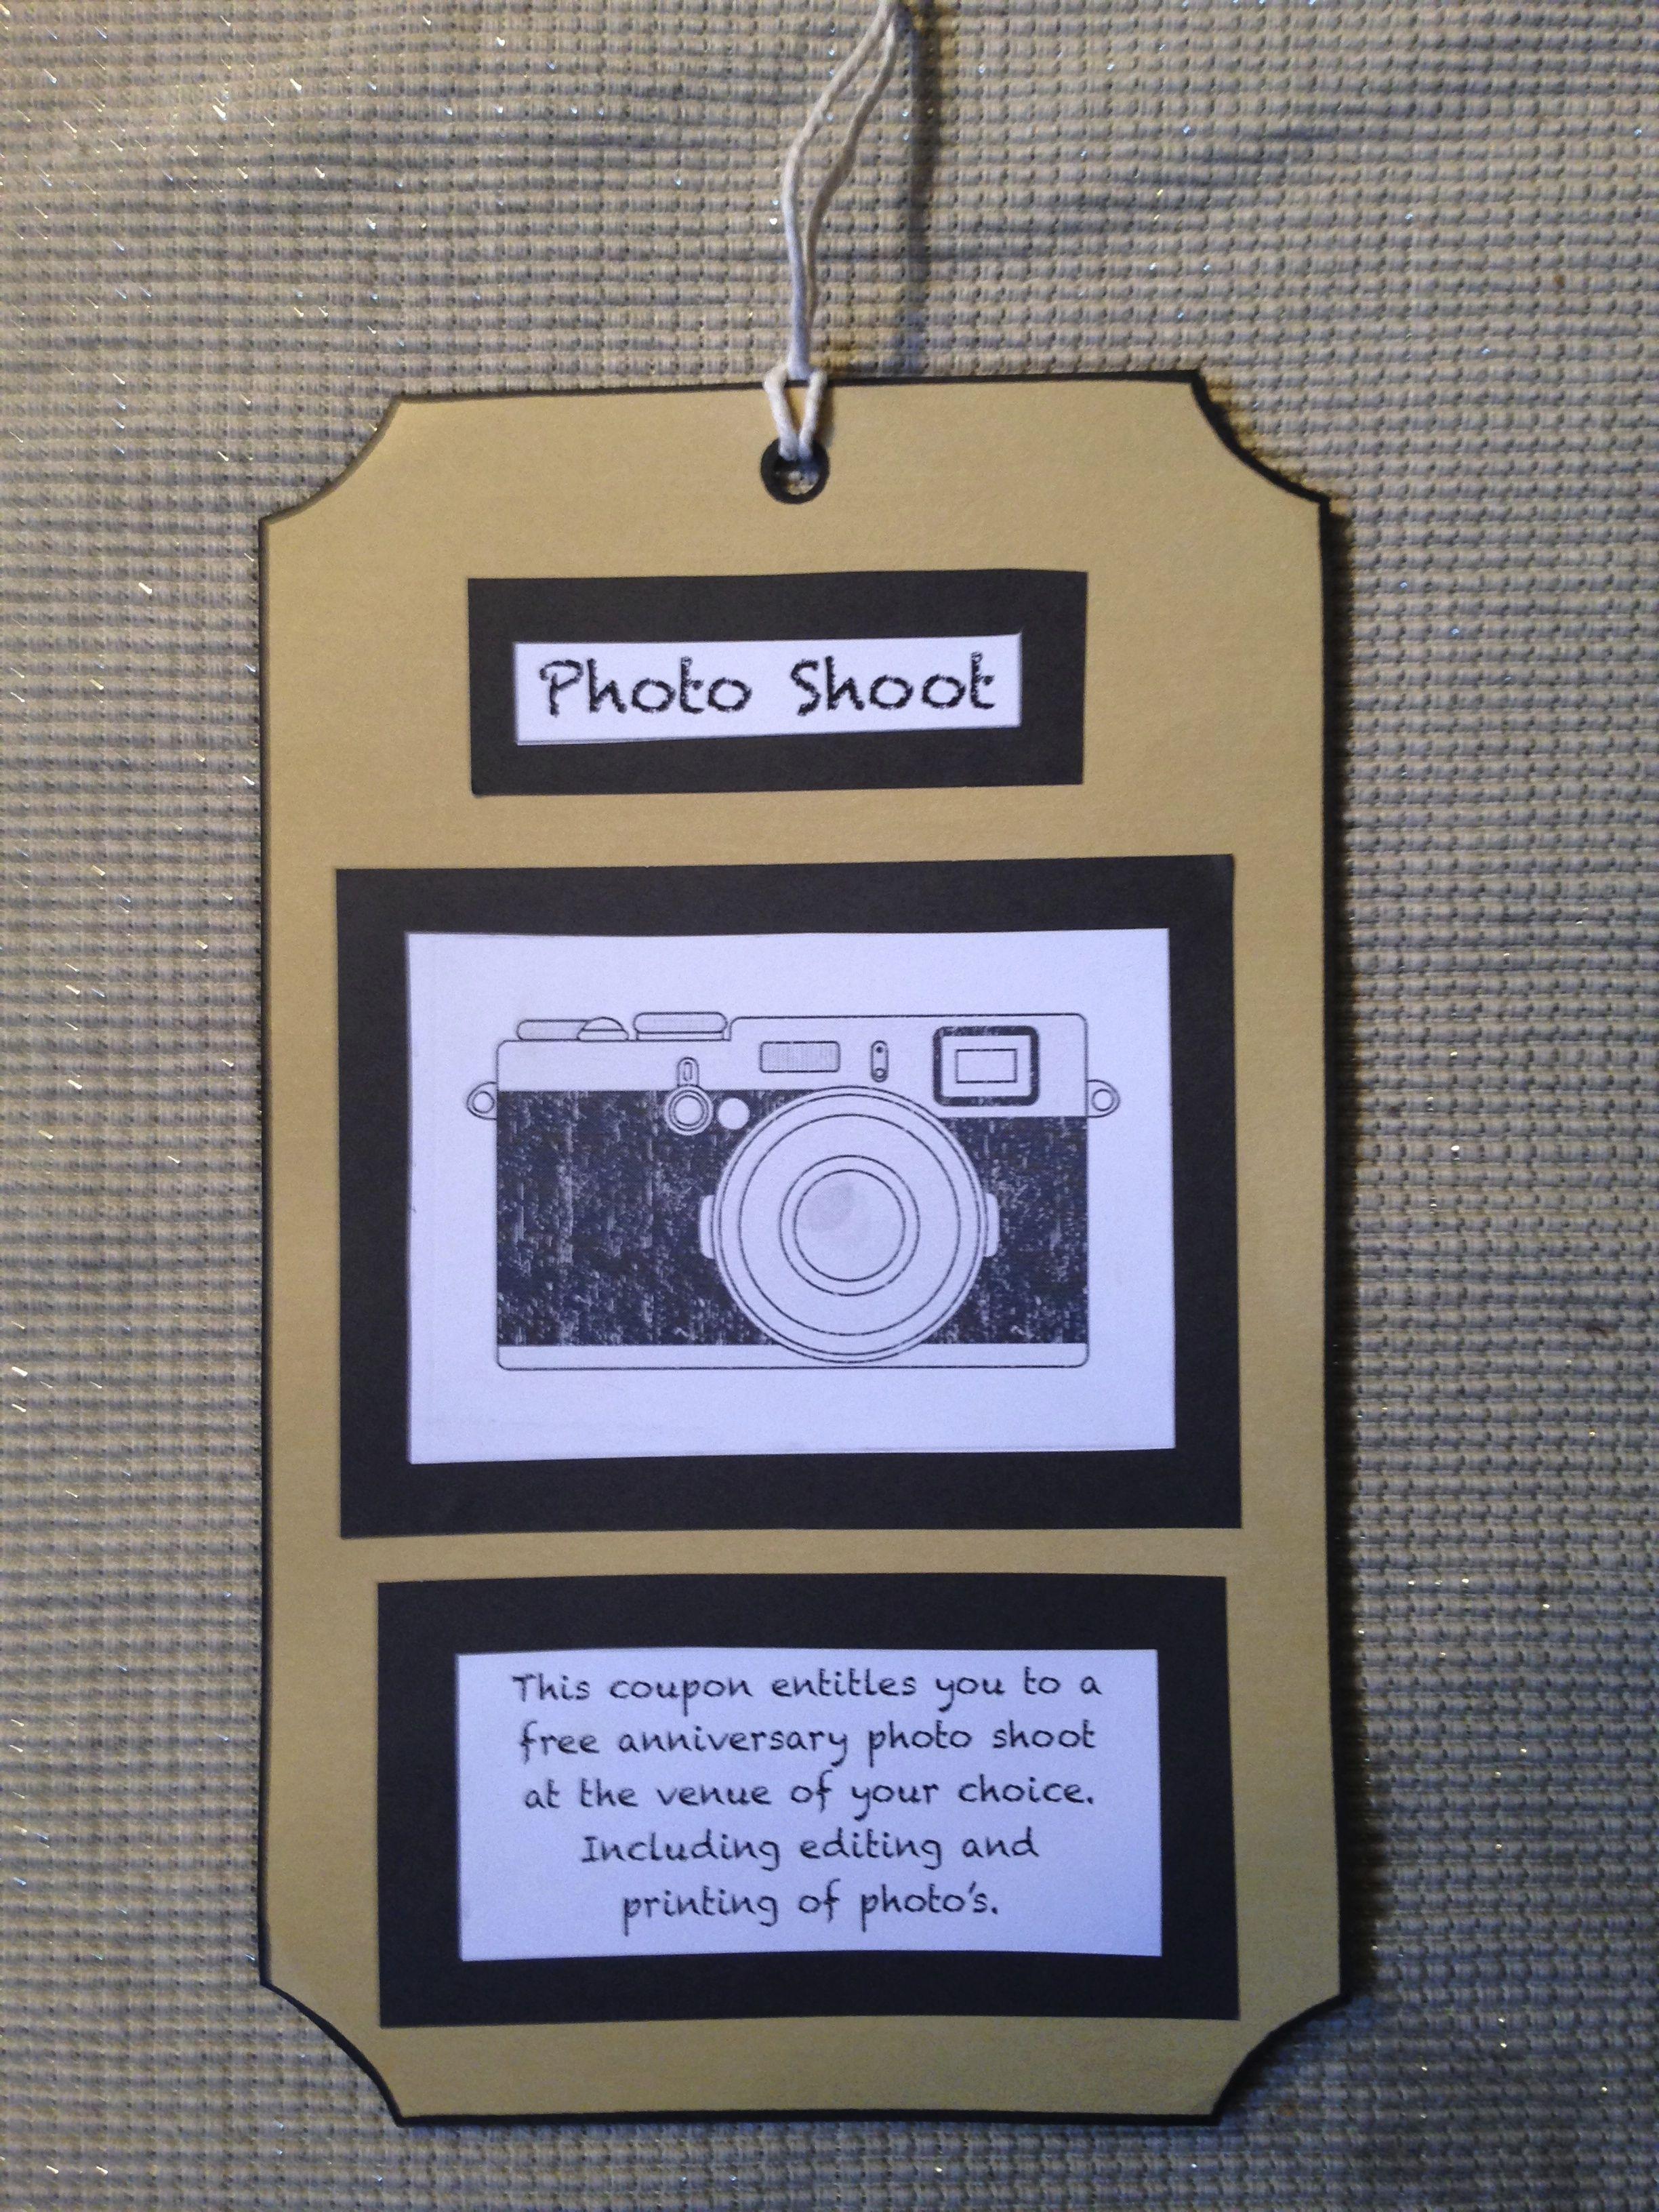 Fantastic coupon idea for the photographers..